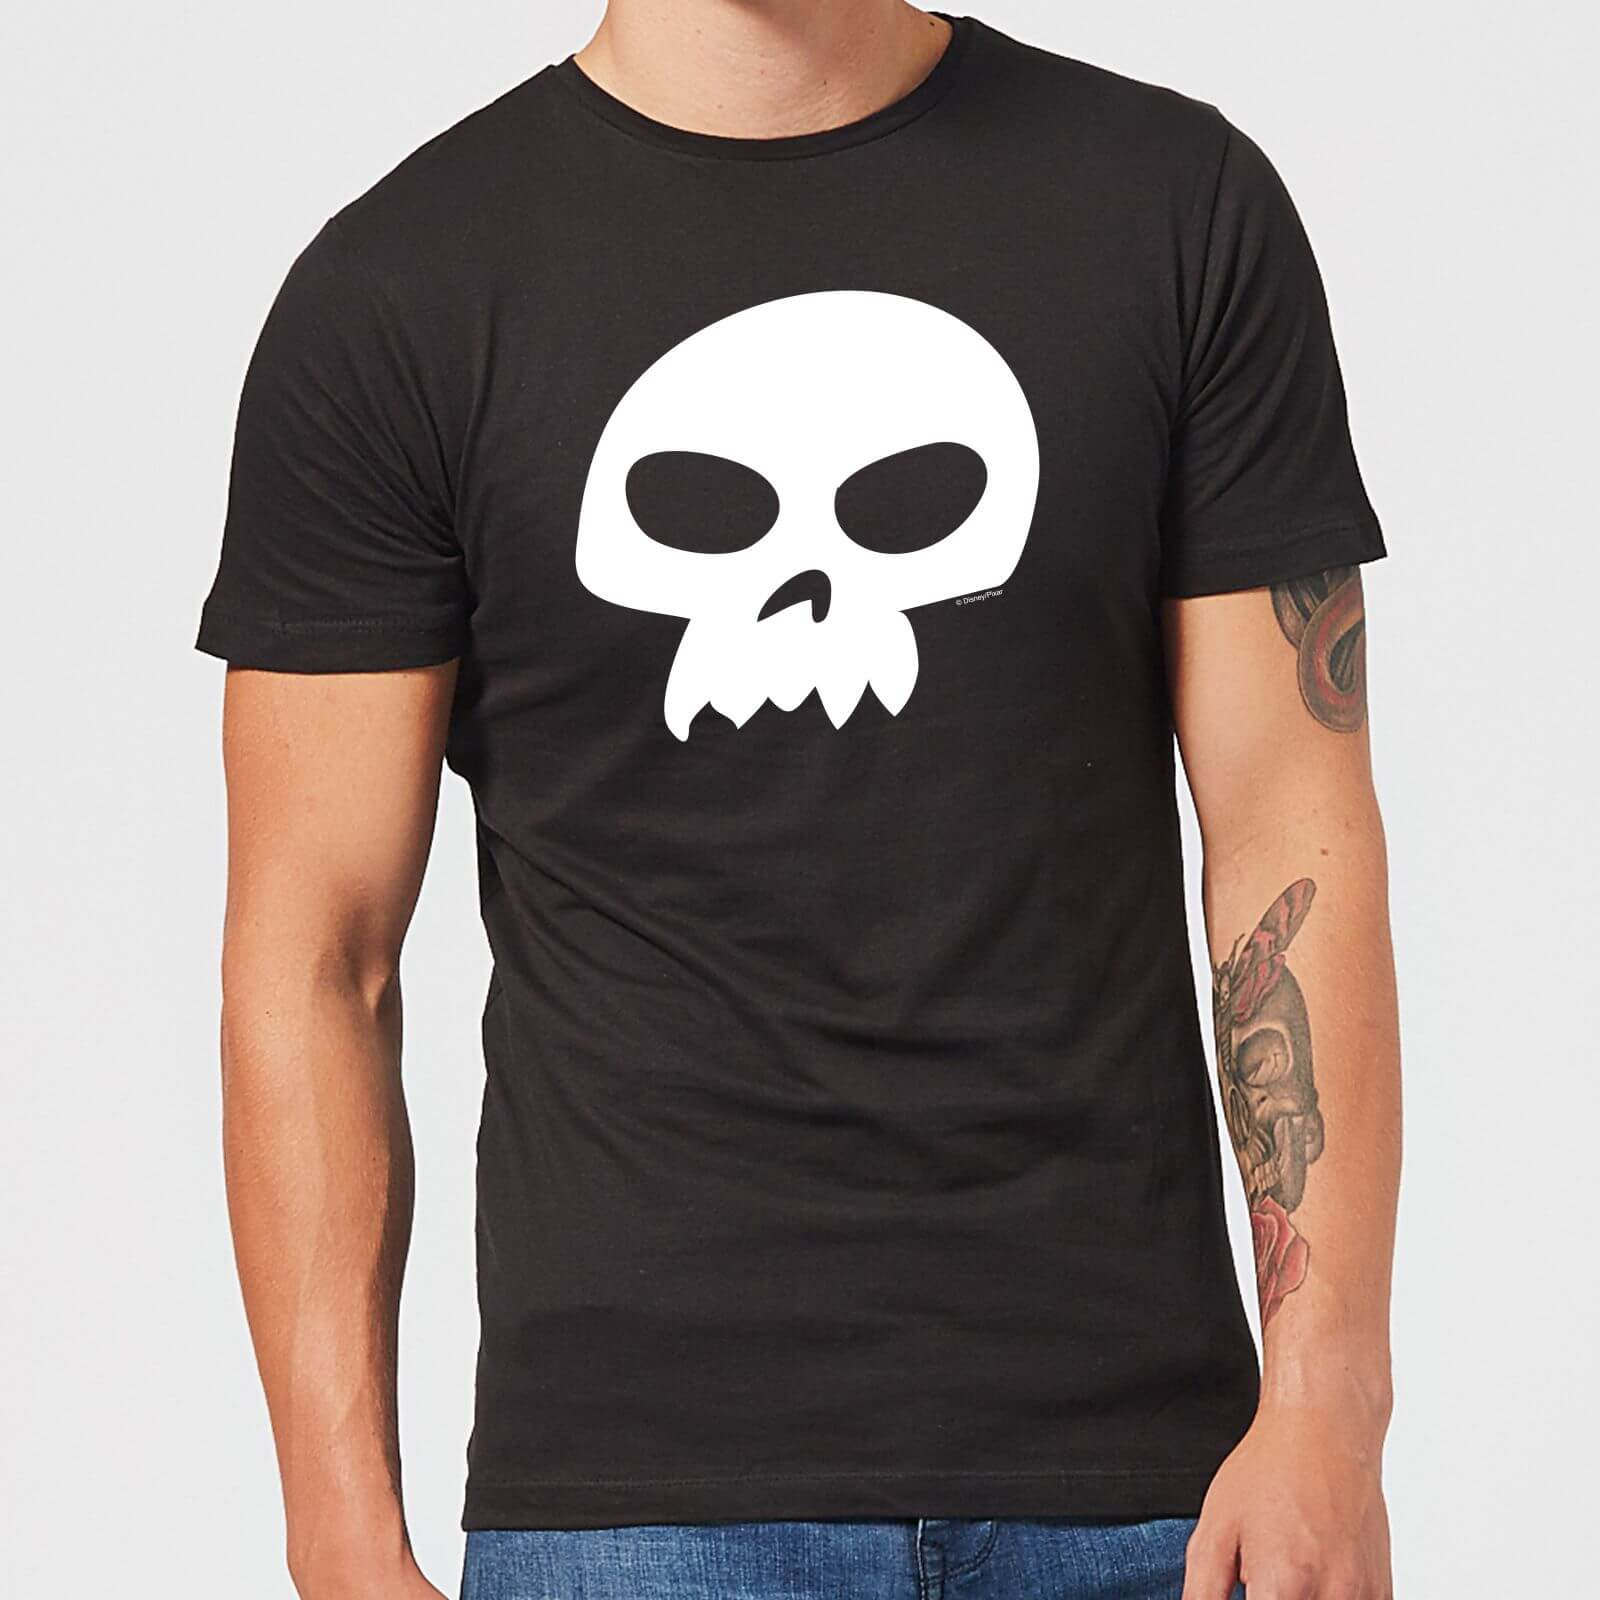 e321ad4d490834 Toy Story Sid's Skull Men's T-Shirt - Black Clothing   Zavvi